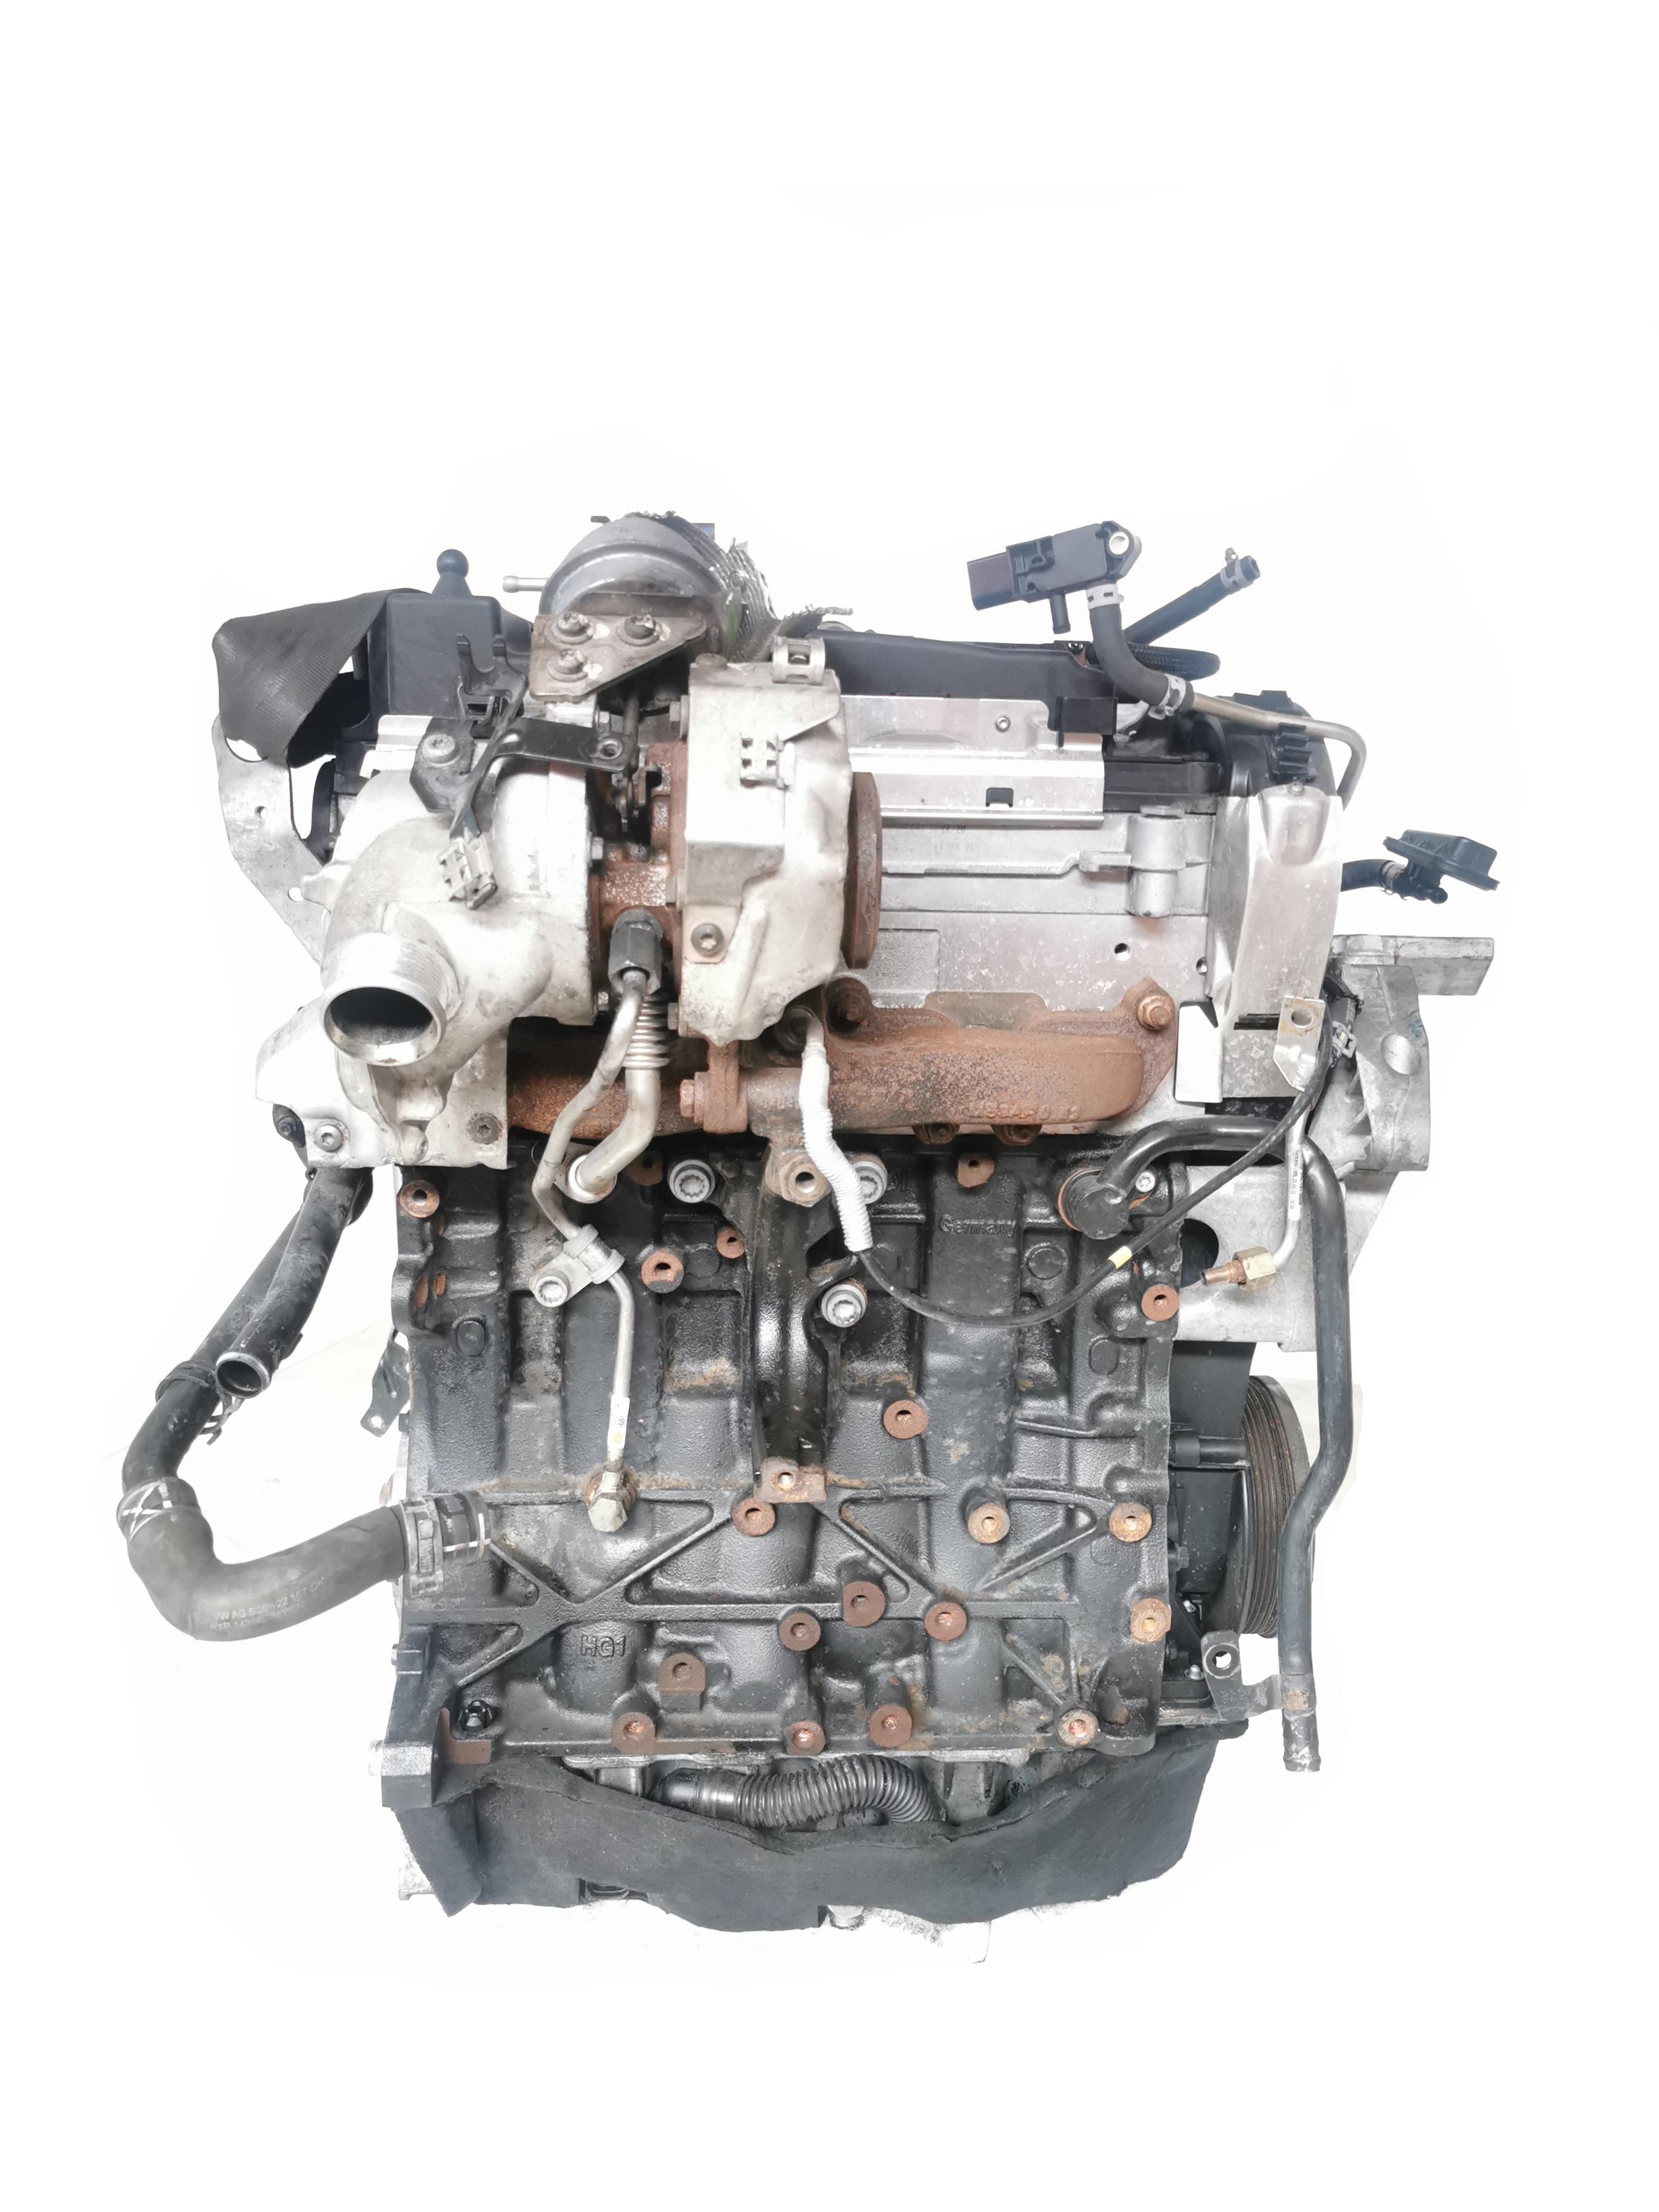 Motor 2013 mit Anbauteilen VW Audi Golf VII Leon Octavia A3 1,6 TDI CLH CLHA